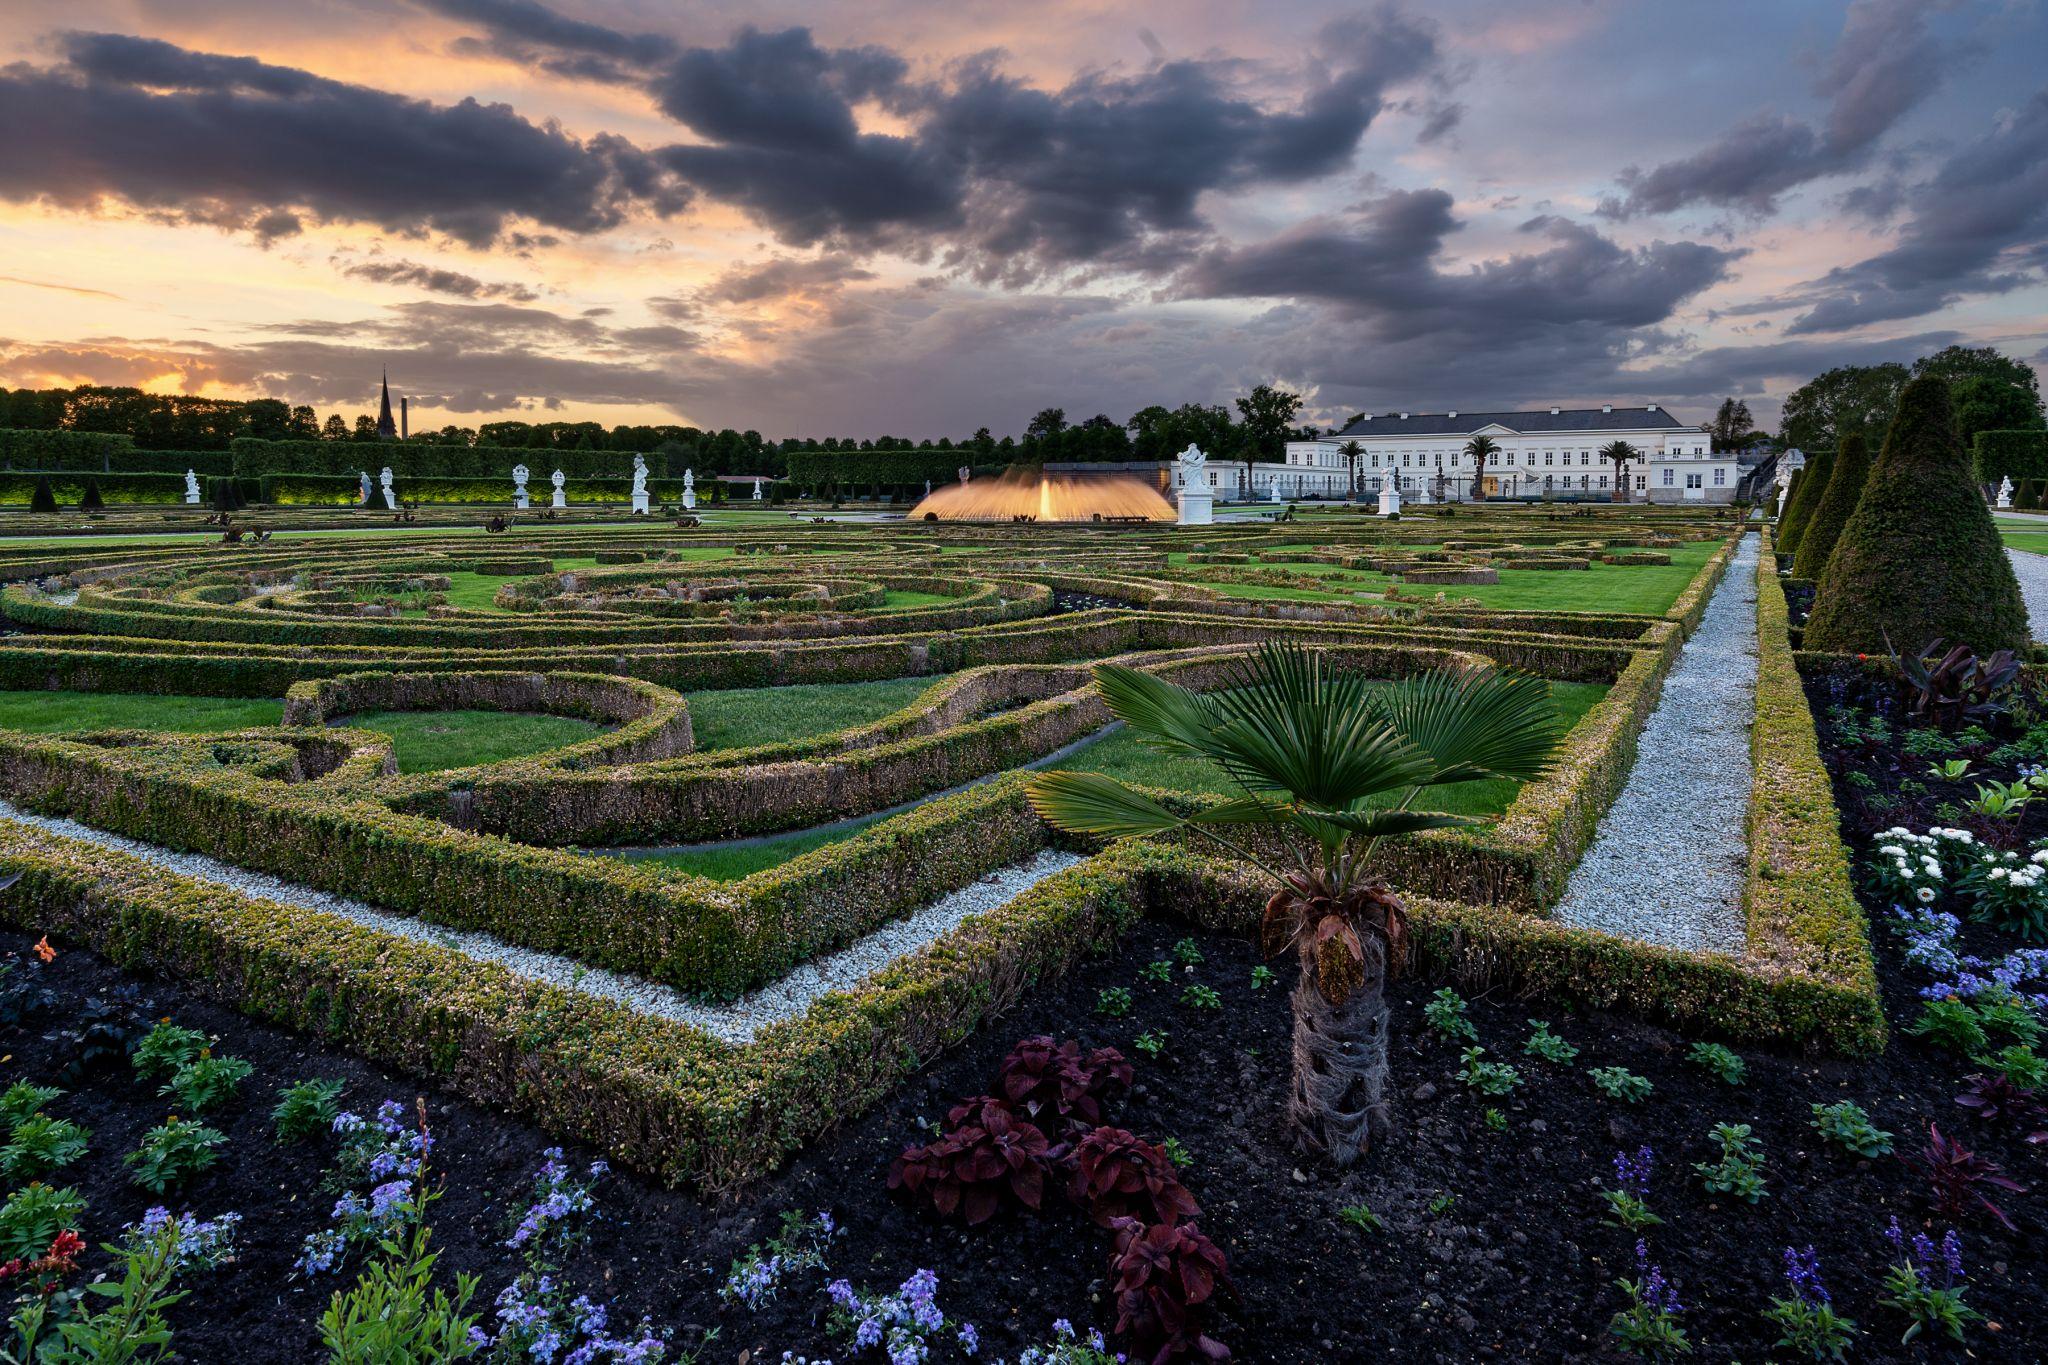 Großer Garten Herrenhausen, Germany